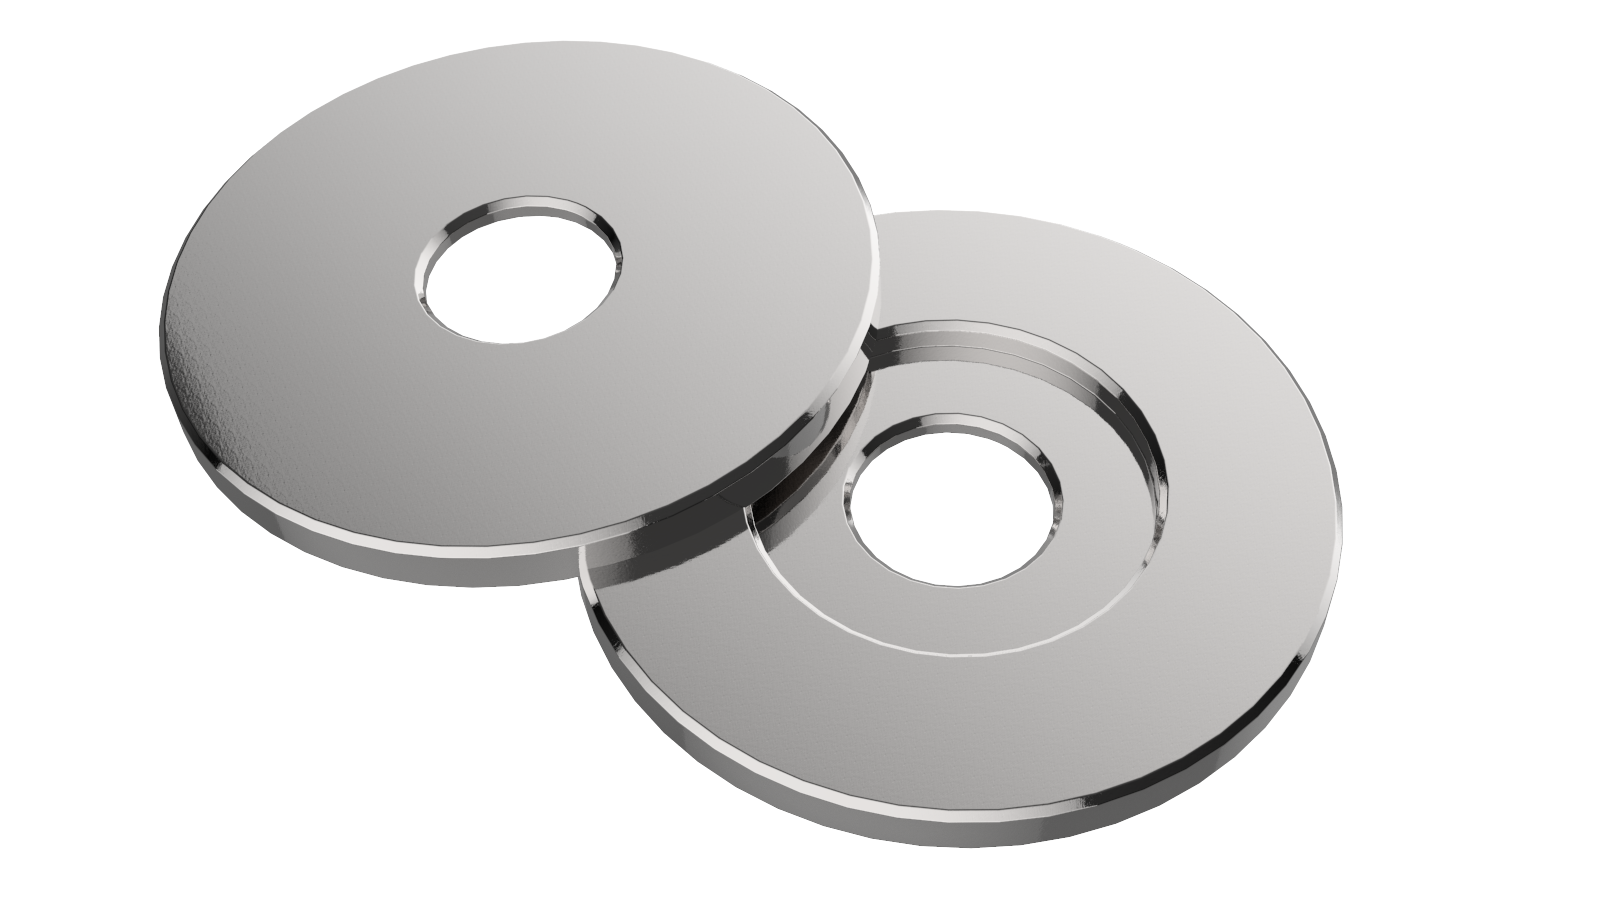 PICO 155 50 mm diameter flanges